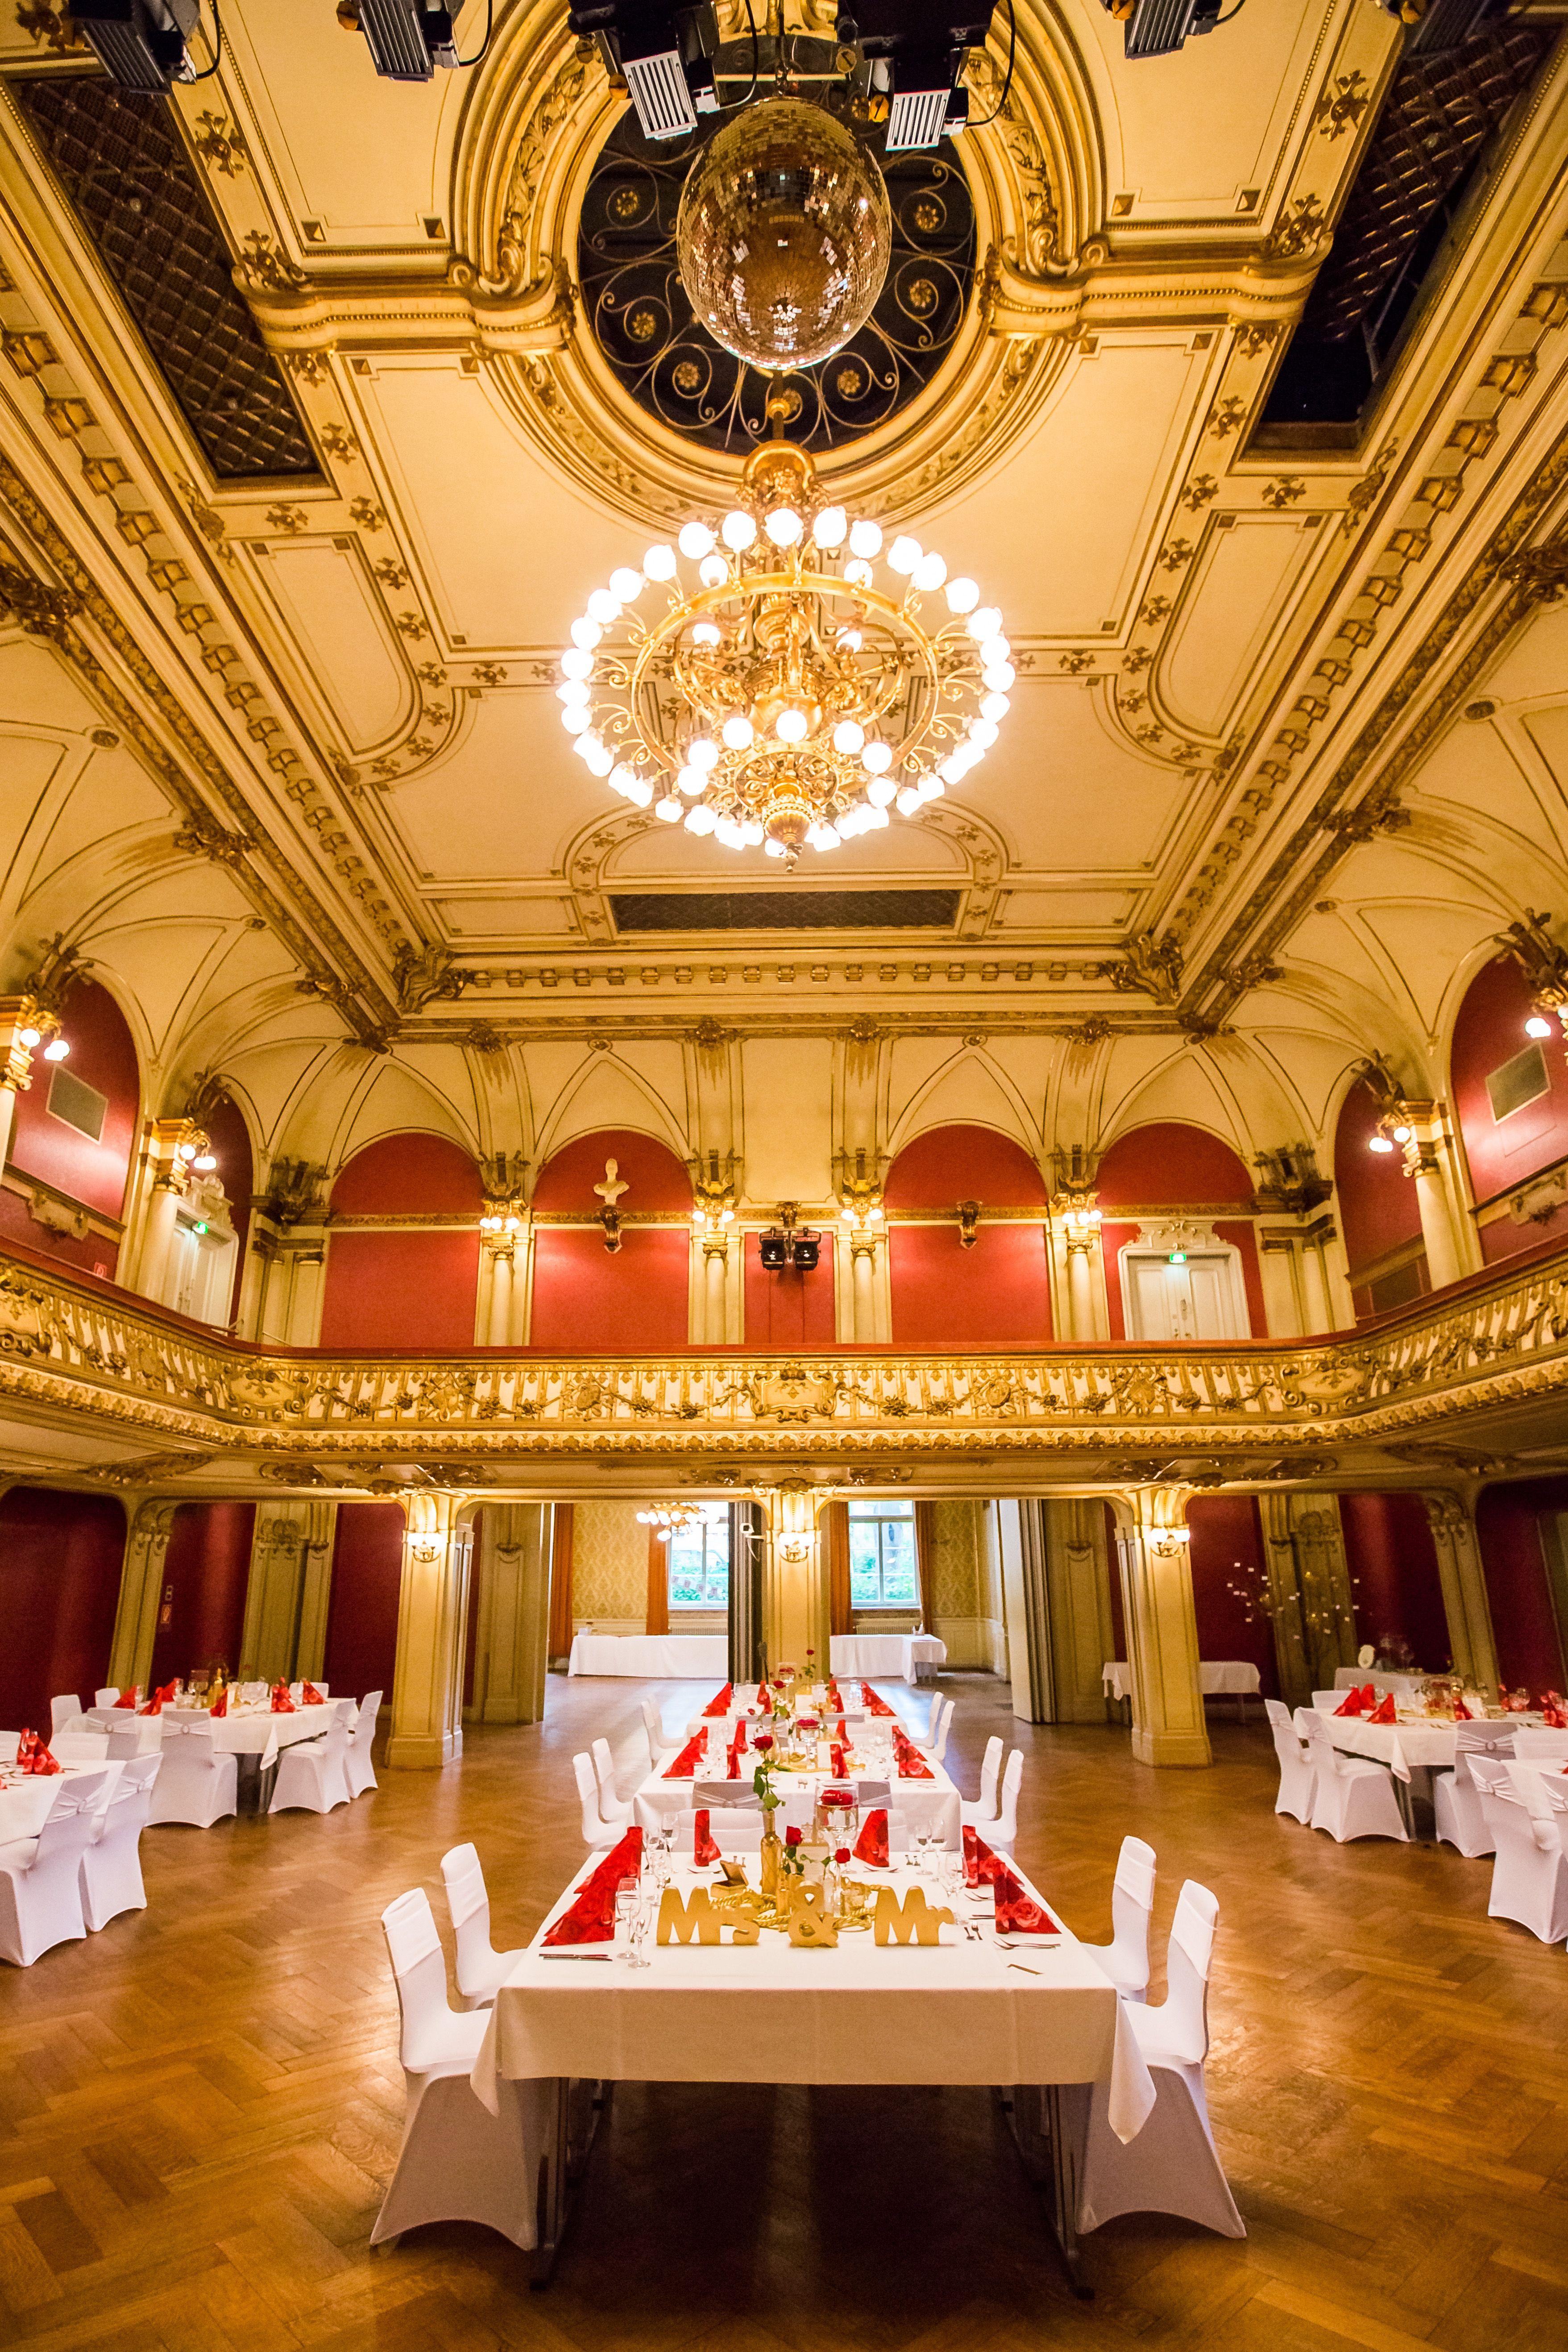 Konzerthaus in Ravensburg #konzerthaus #ravensburg #